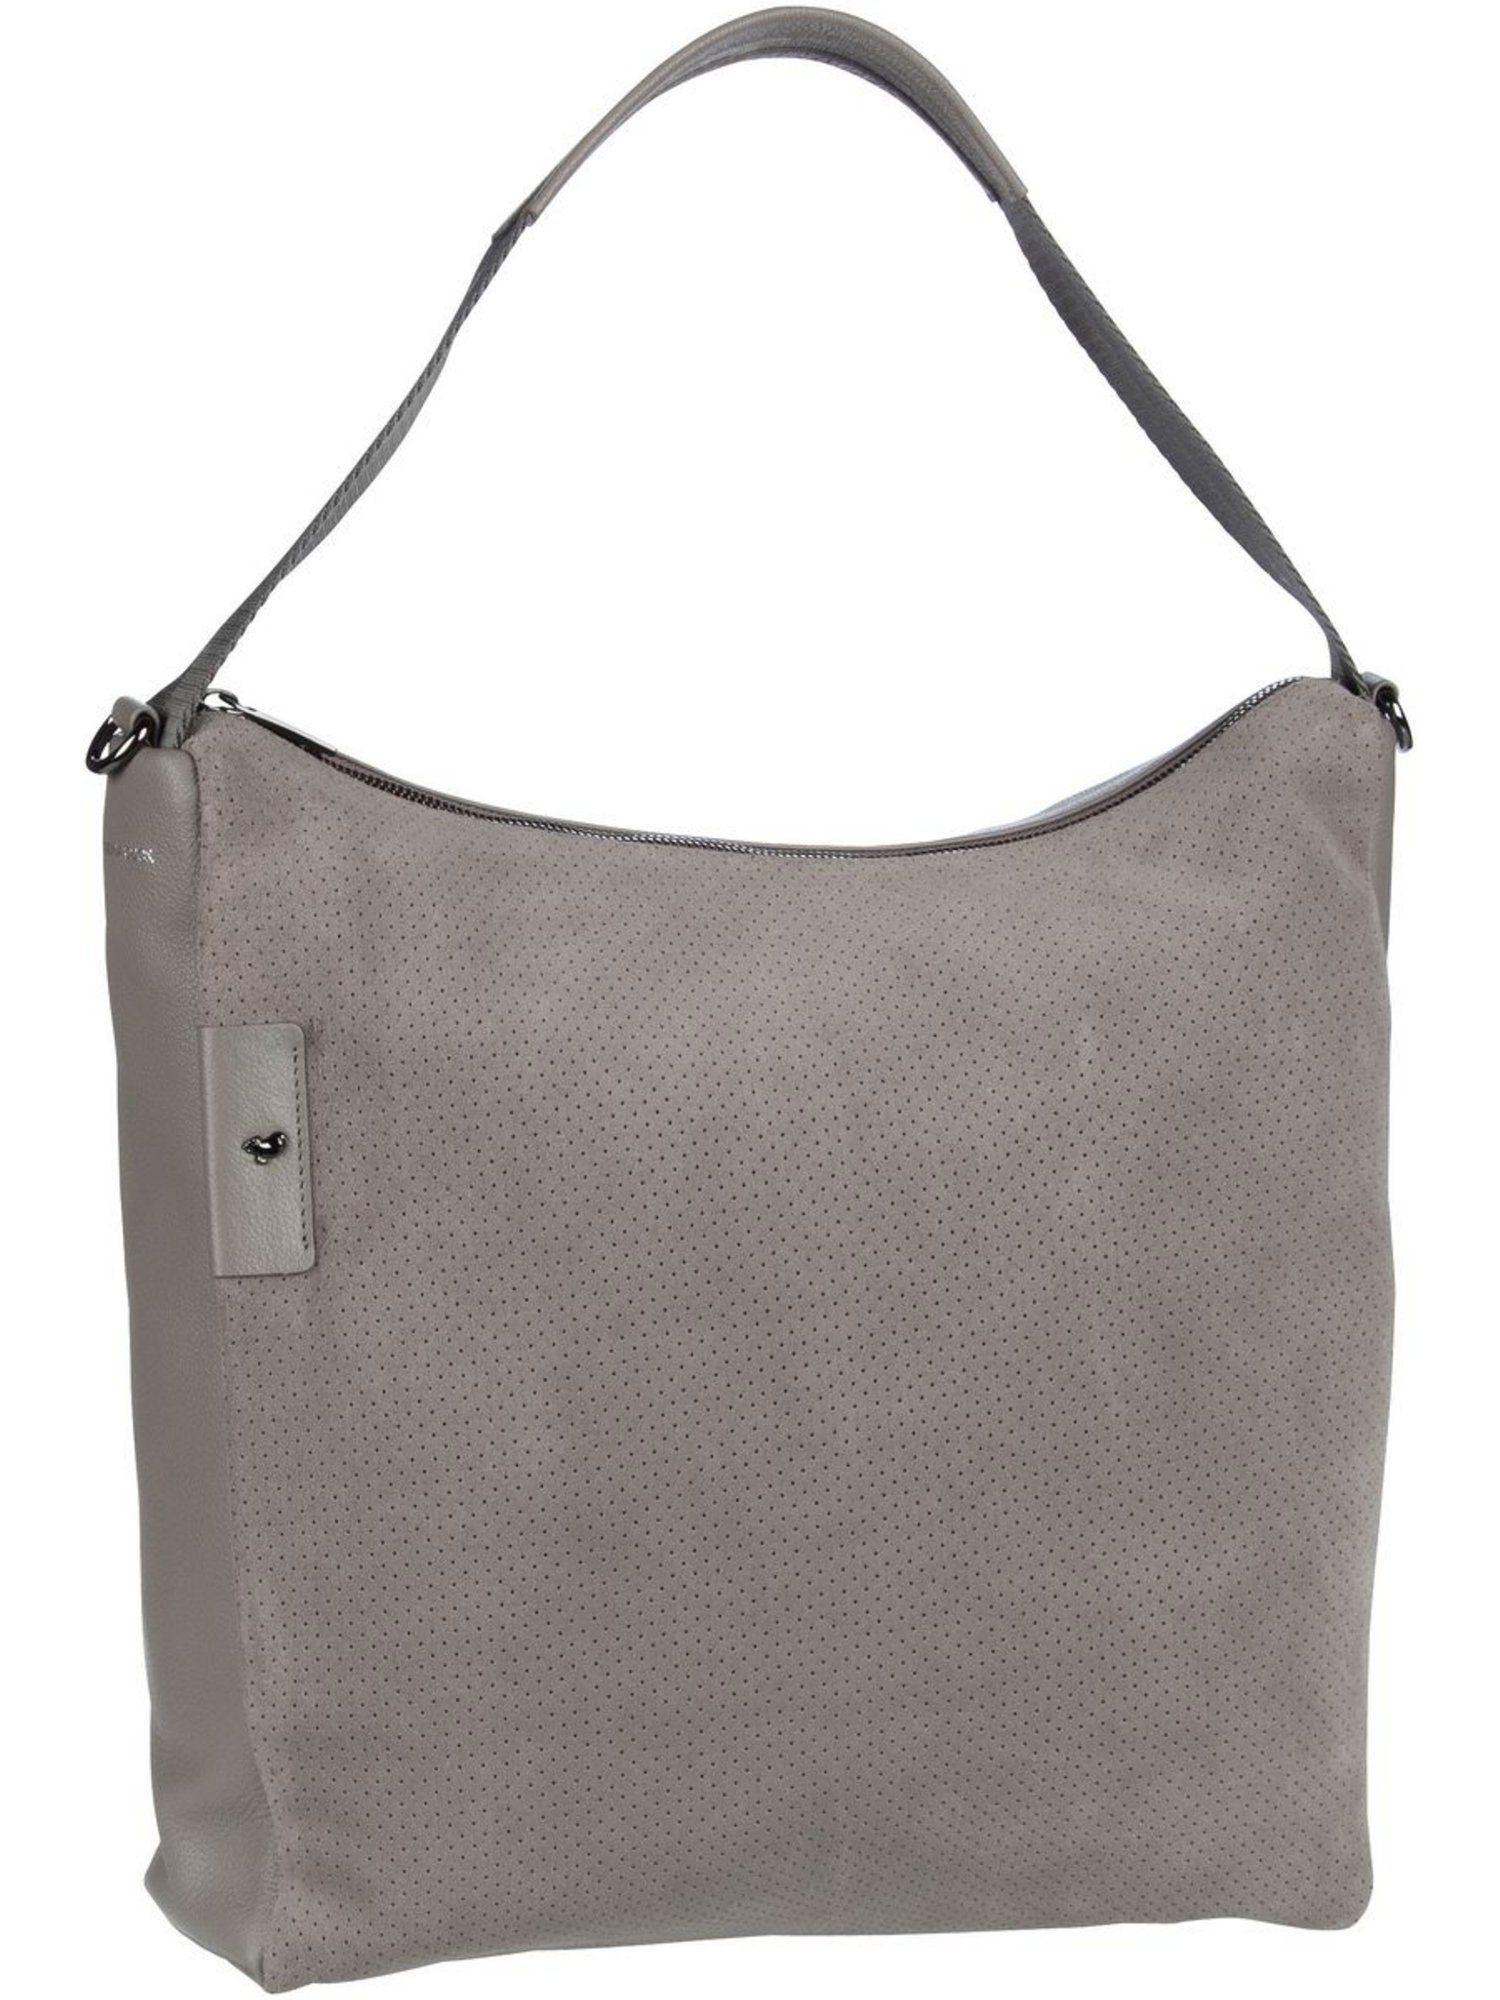 Mandarina Duck Handtasche »Manhattan Medium Hobo UAT95«, Beuteltasche Hobo Bag online kaufen | OTTO